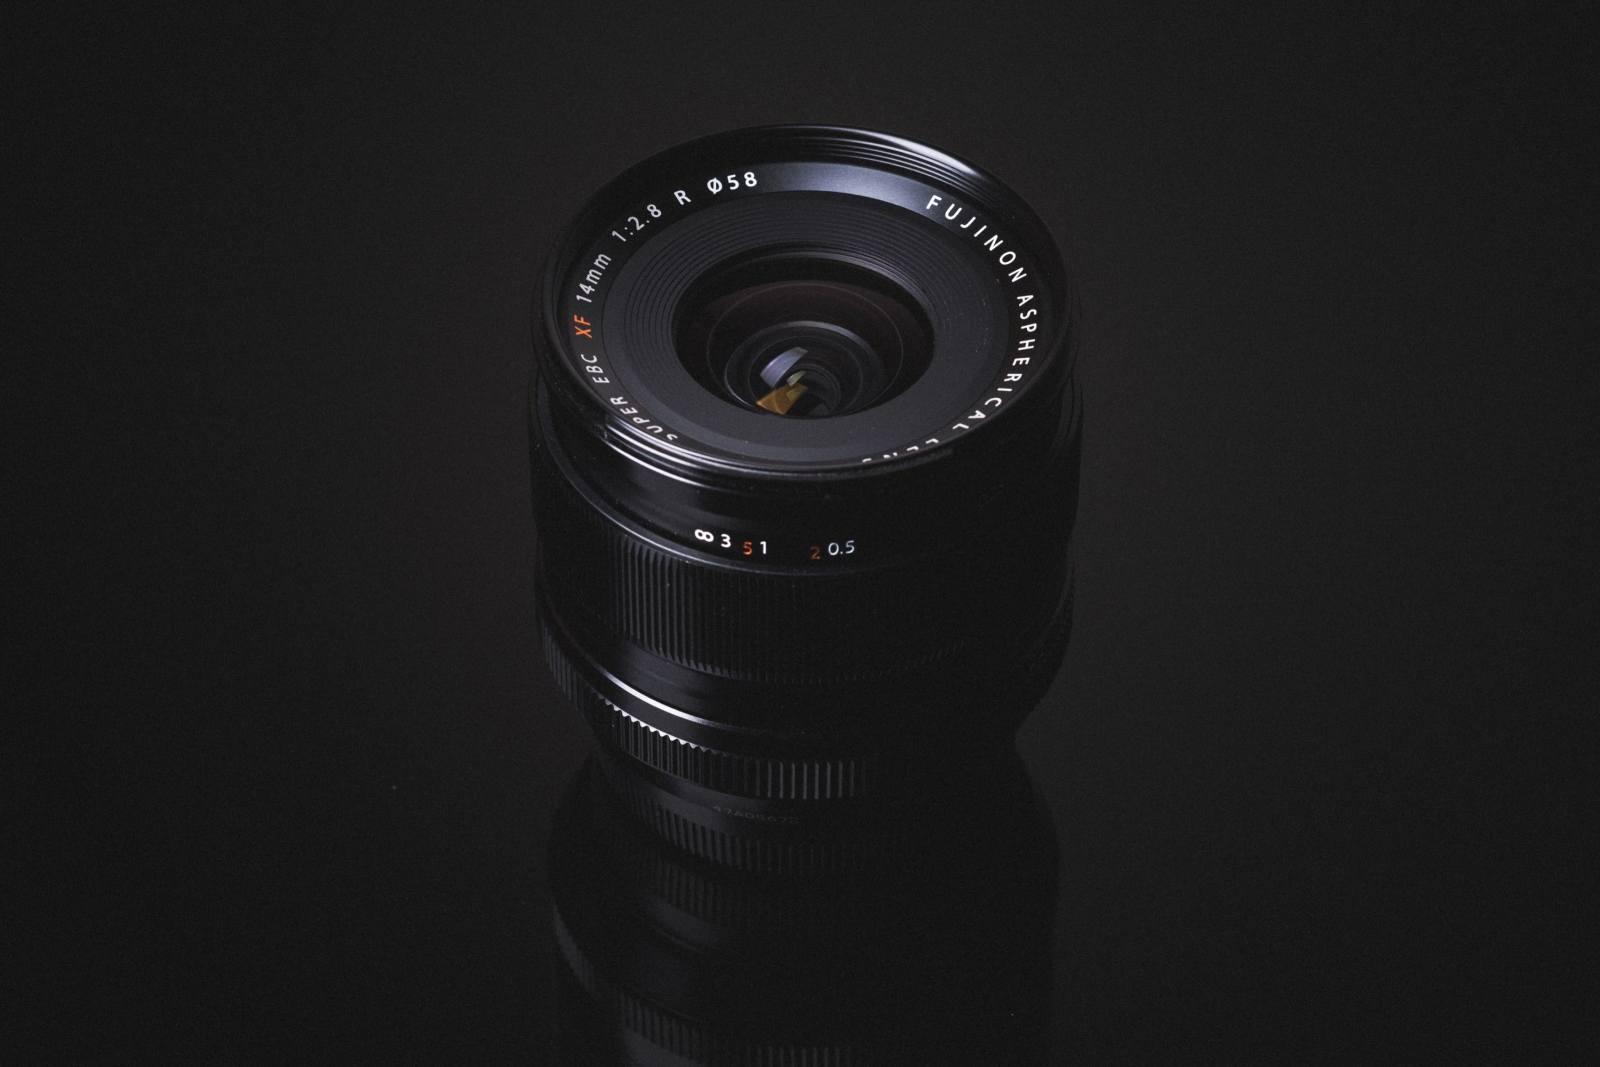 Fujifilm 14mm f2.8 Review & Sample Photos